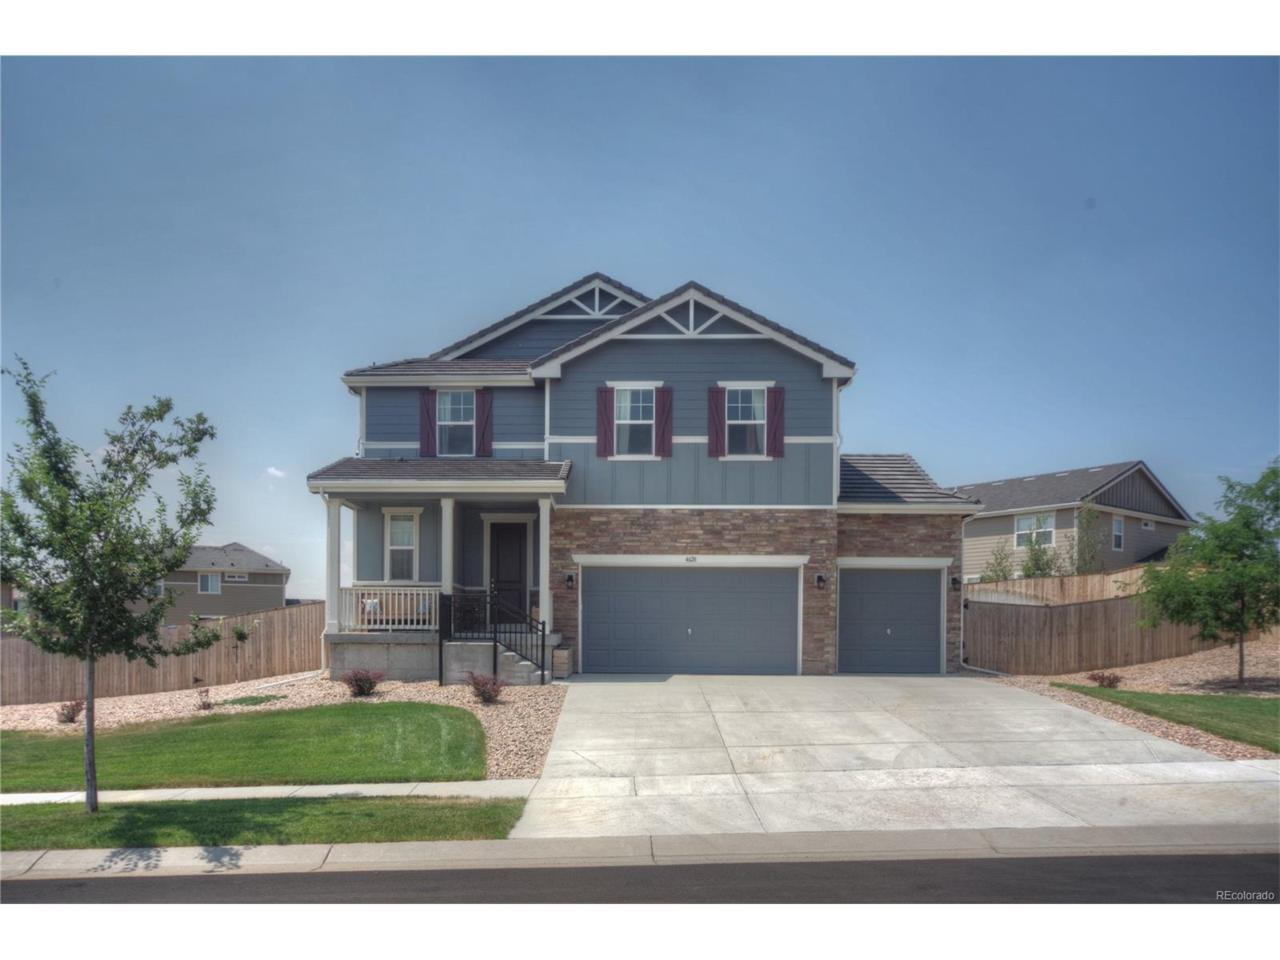 4628 Oxbow Drive, Brighton, CO 80601 (MLS #1937592) :: 8z Real Estate